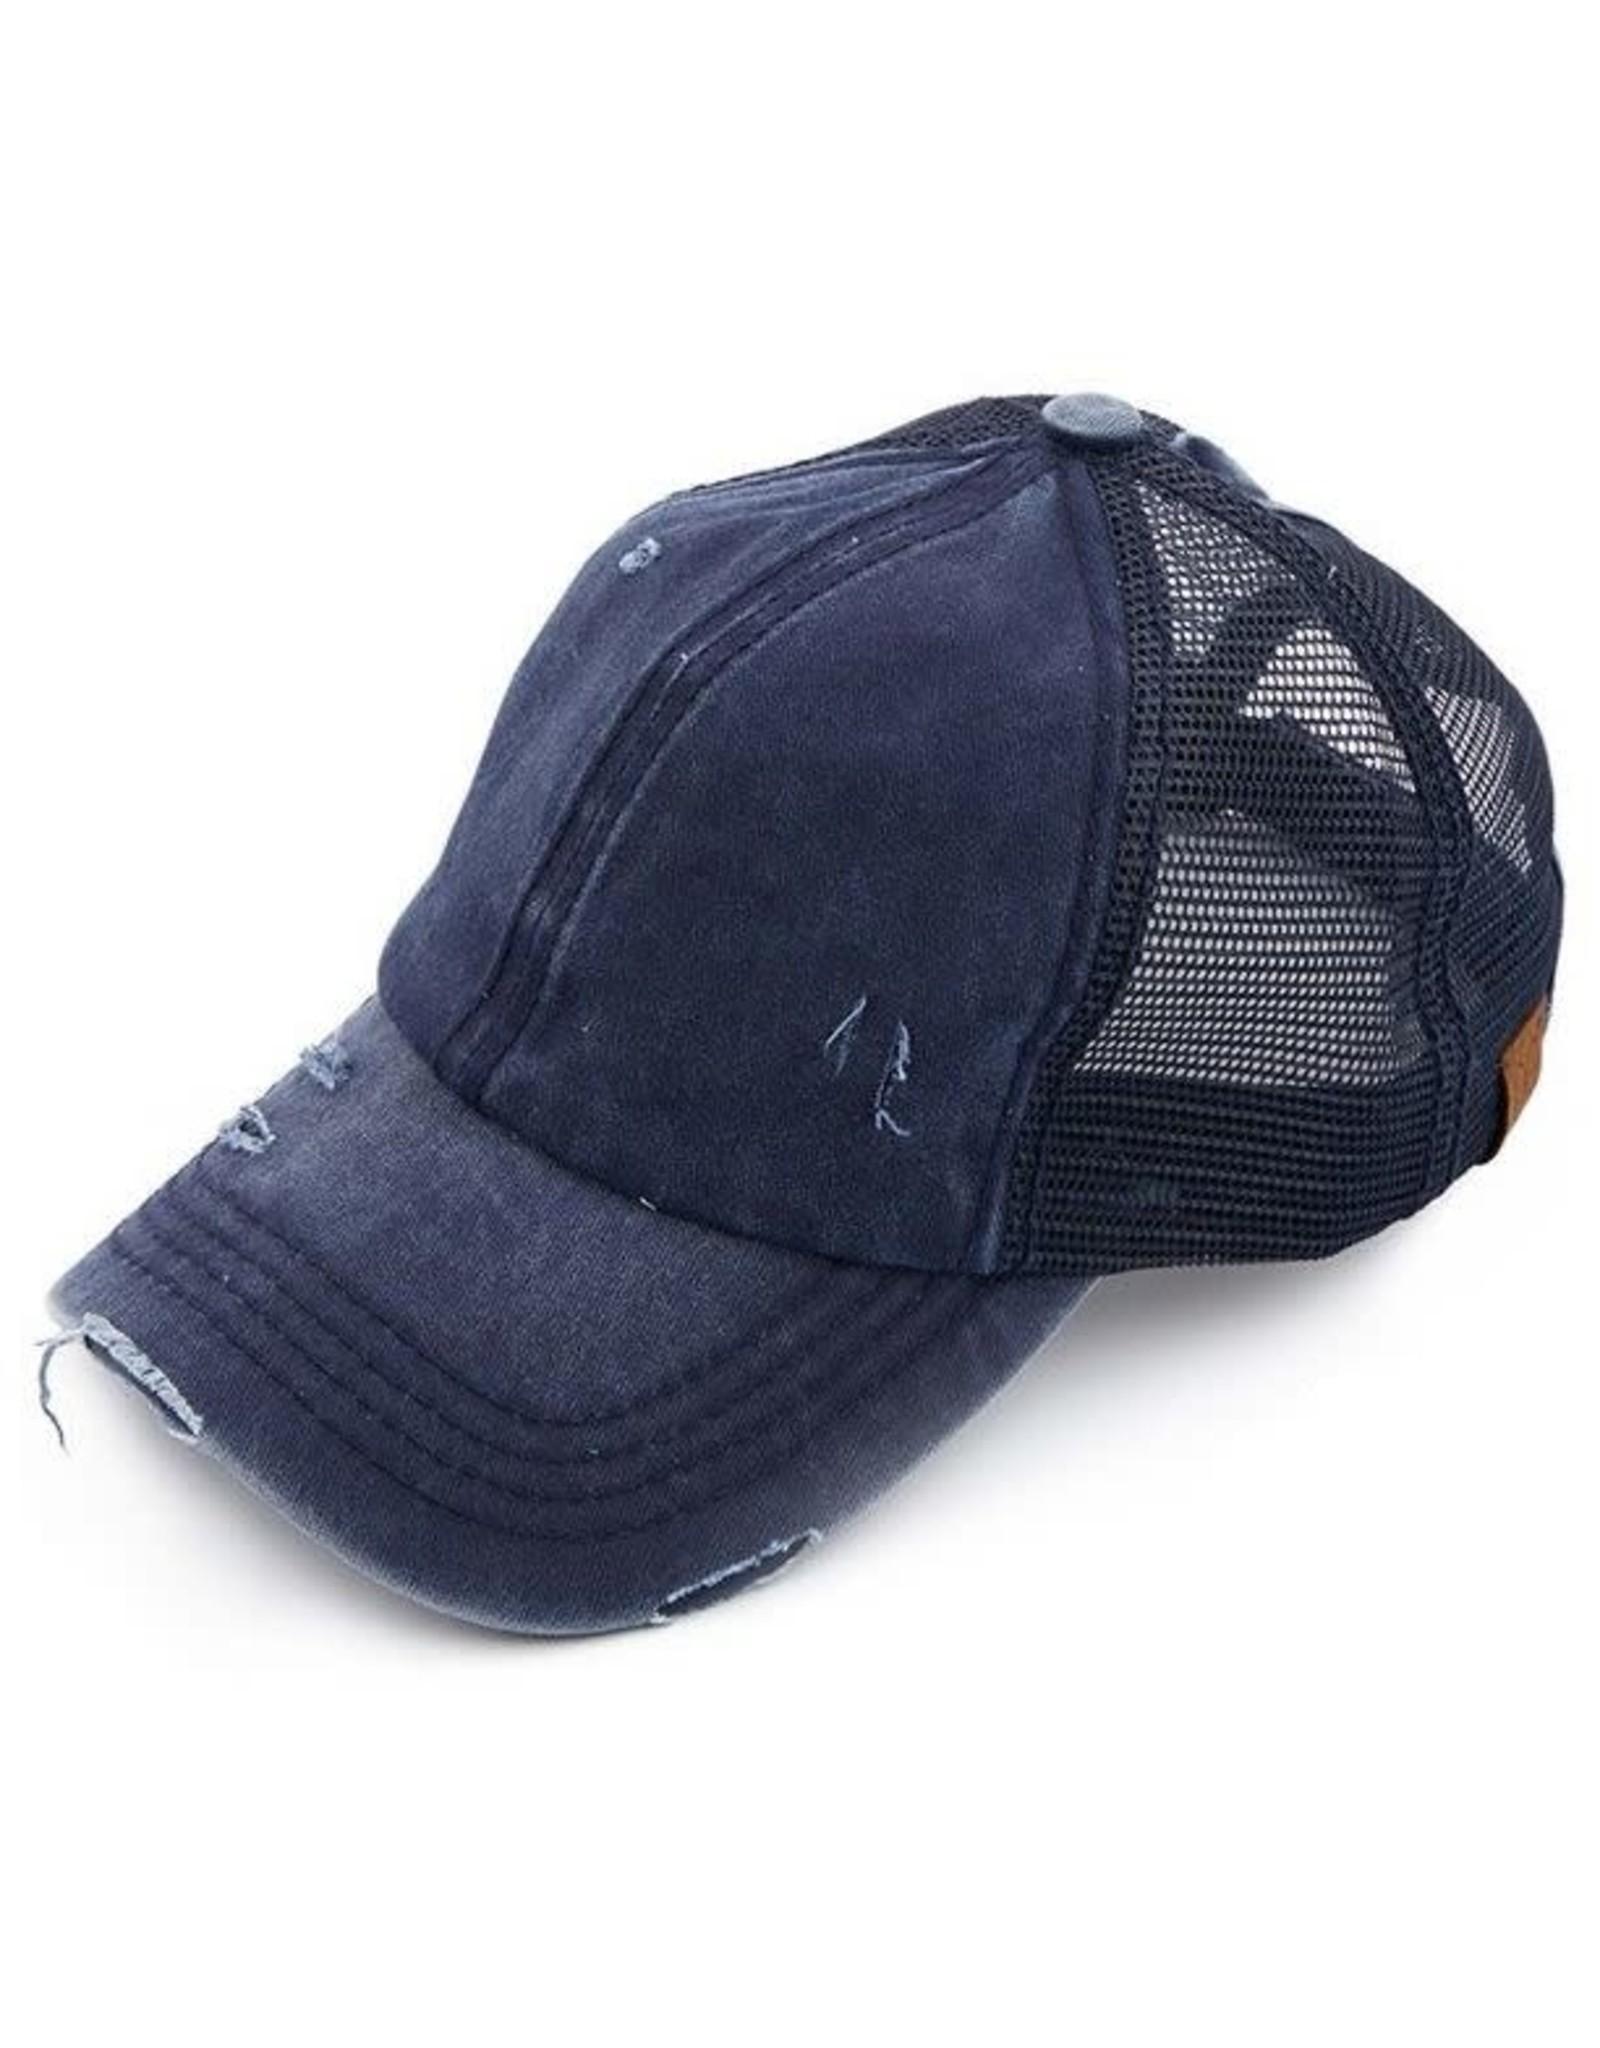 CC DISTRESSED MESH BACK PONY CAP